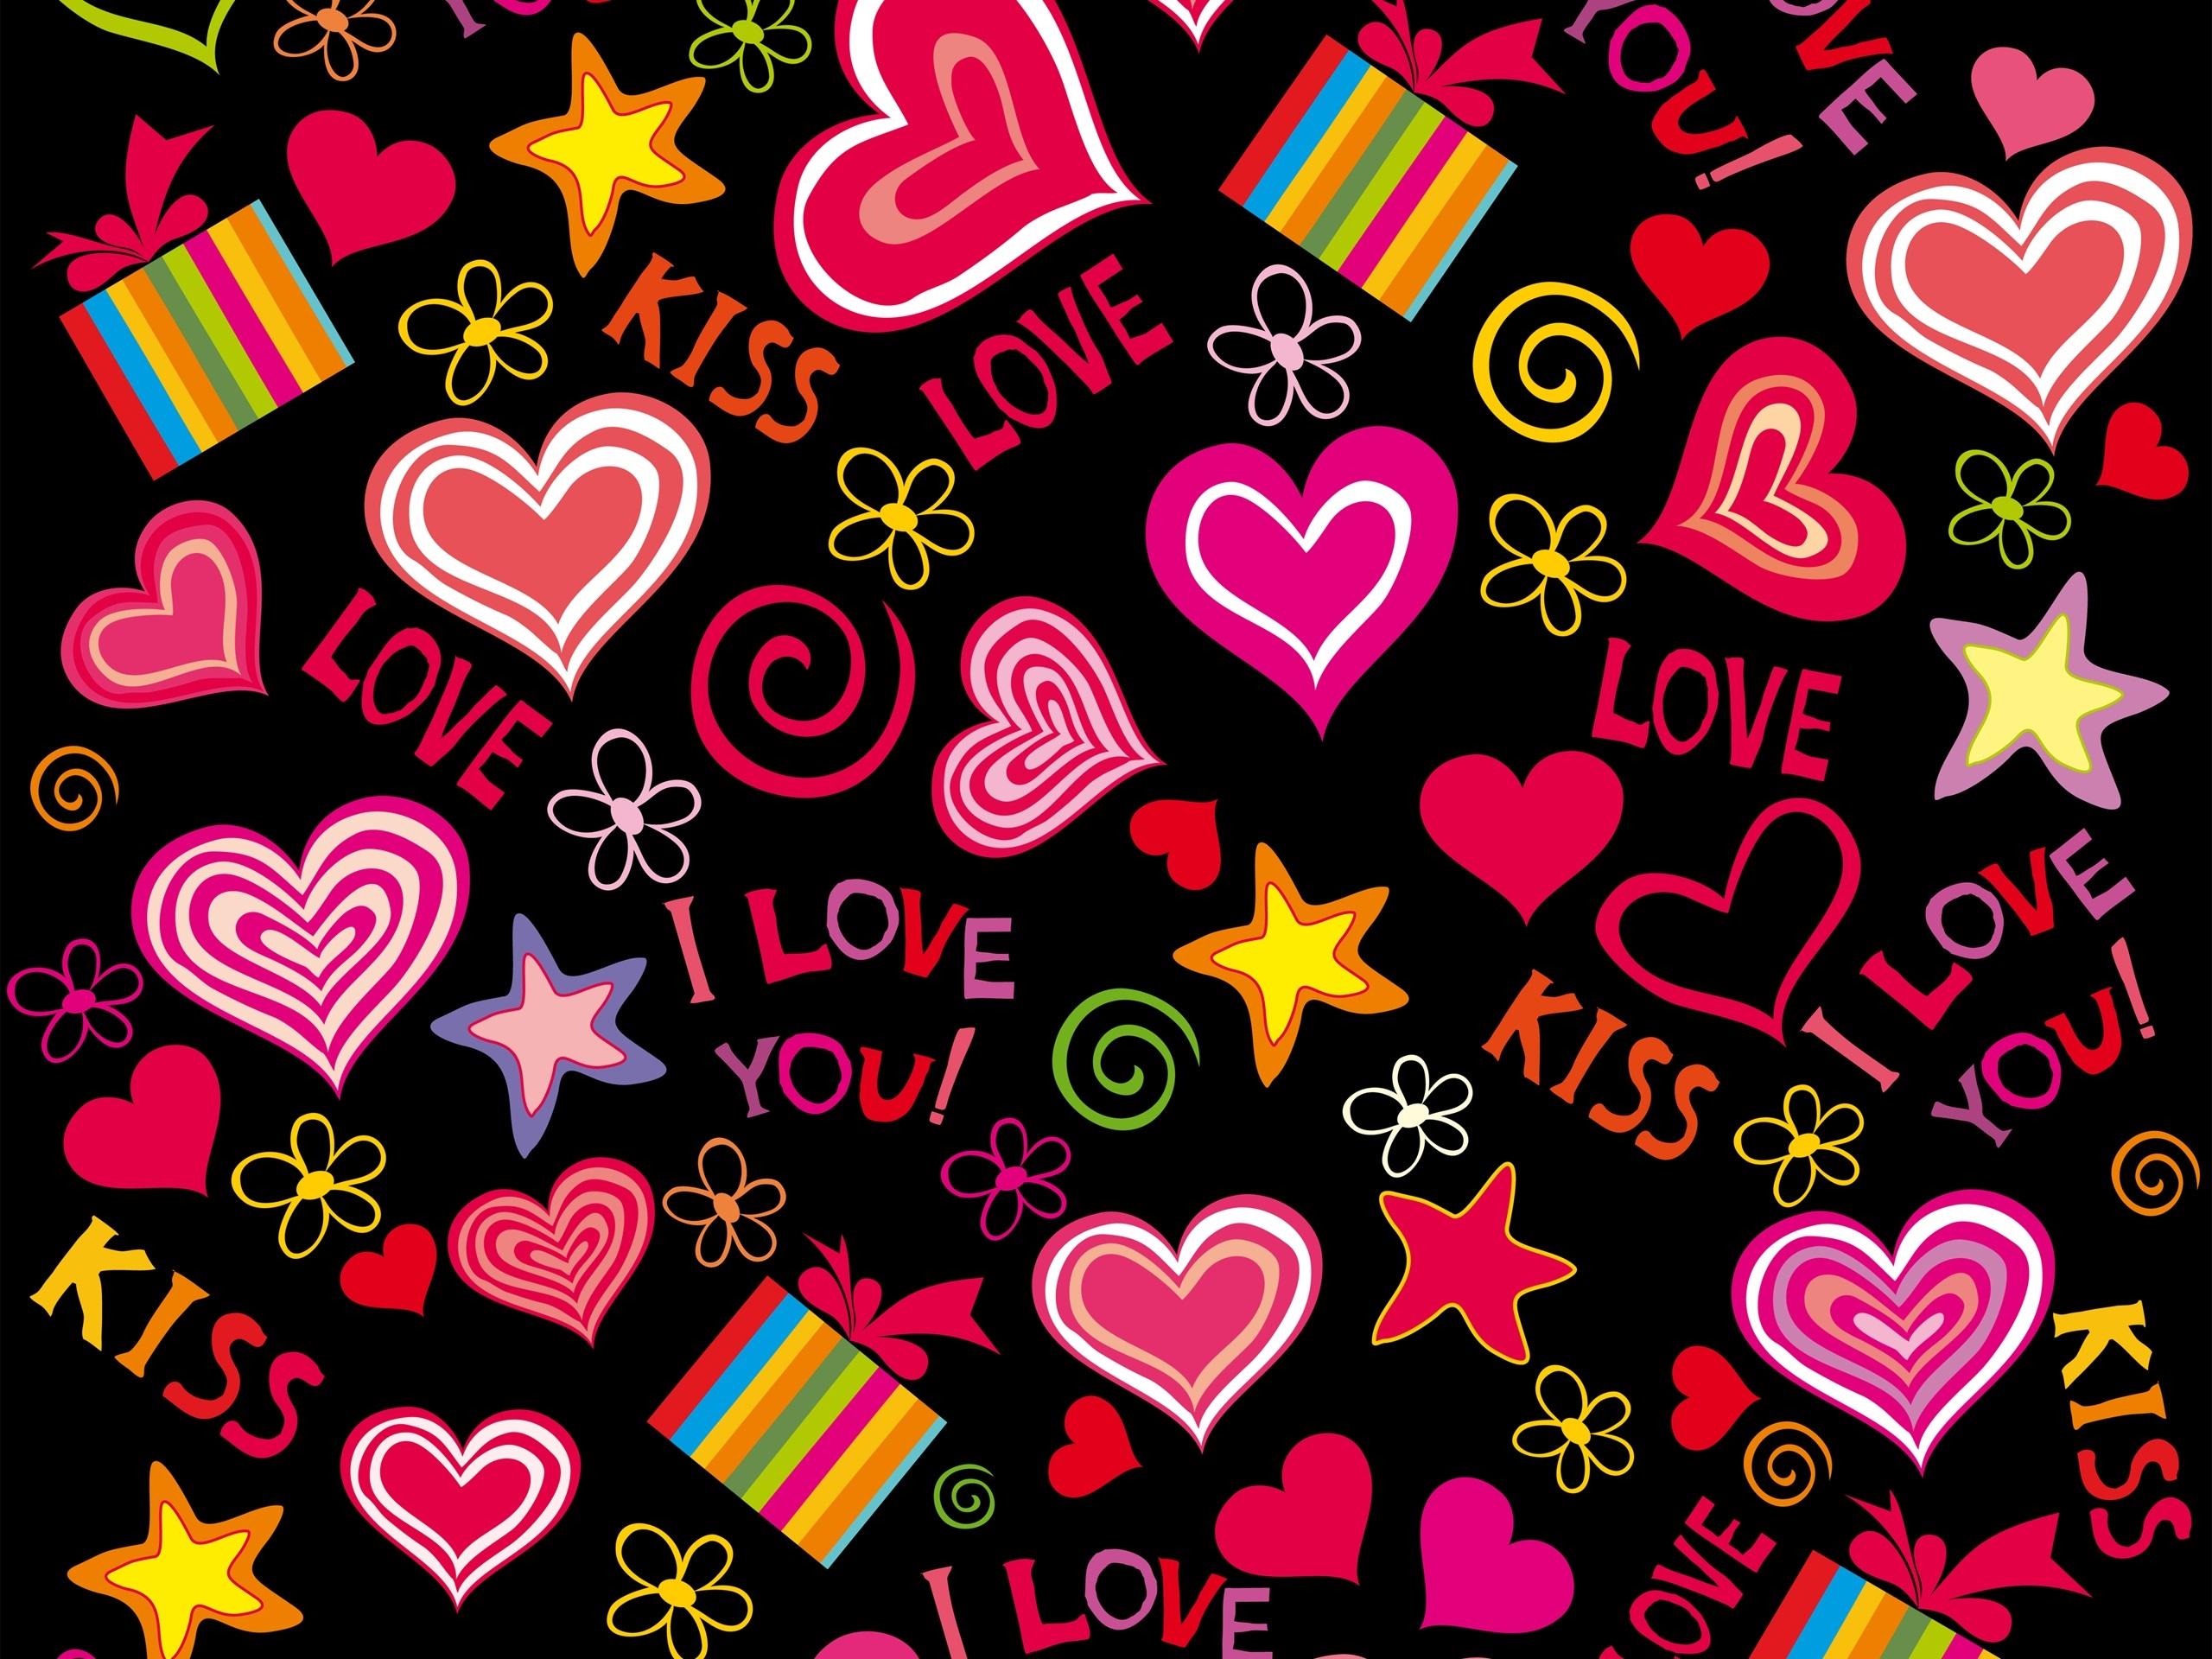 Fondos De Pantalla Animados De San Valentín: Fondos De Pantalla Amor Corazones, Vector, Romántico